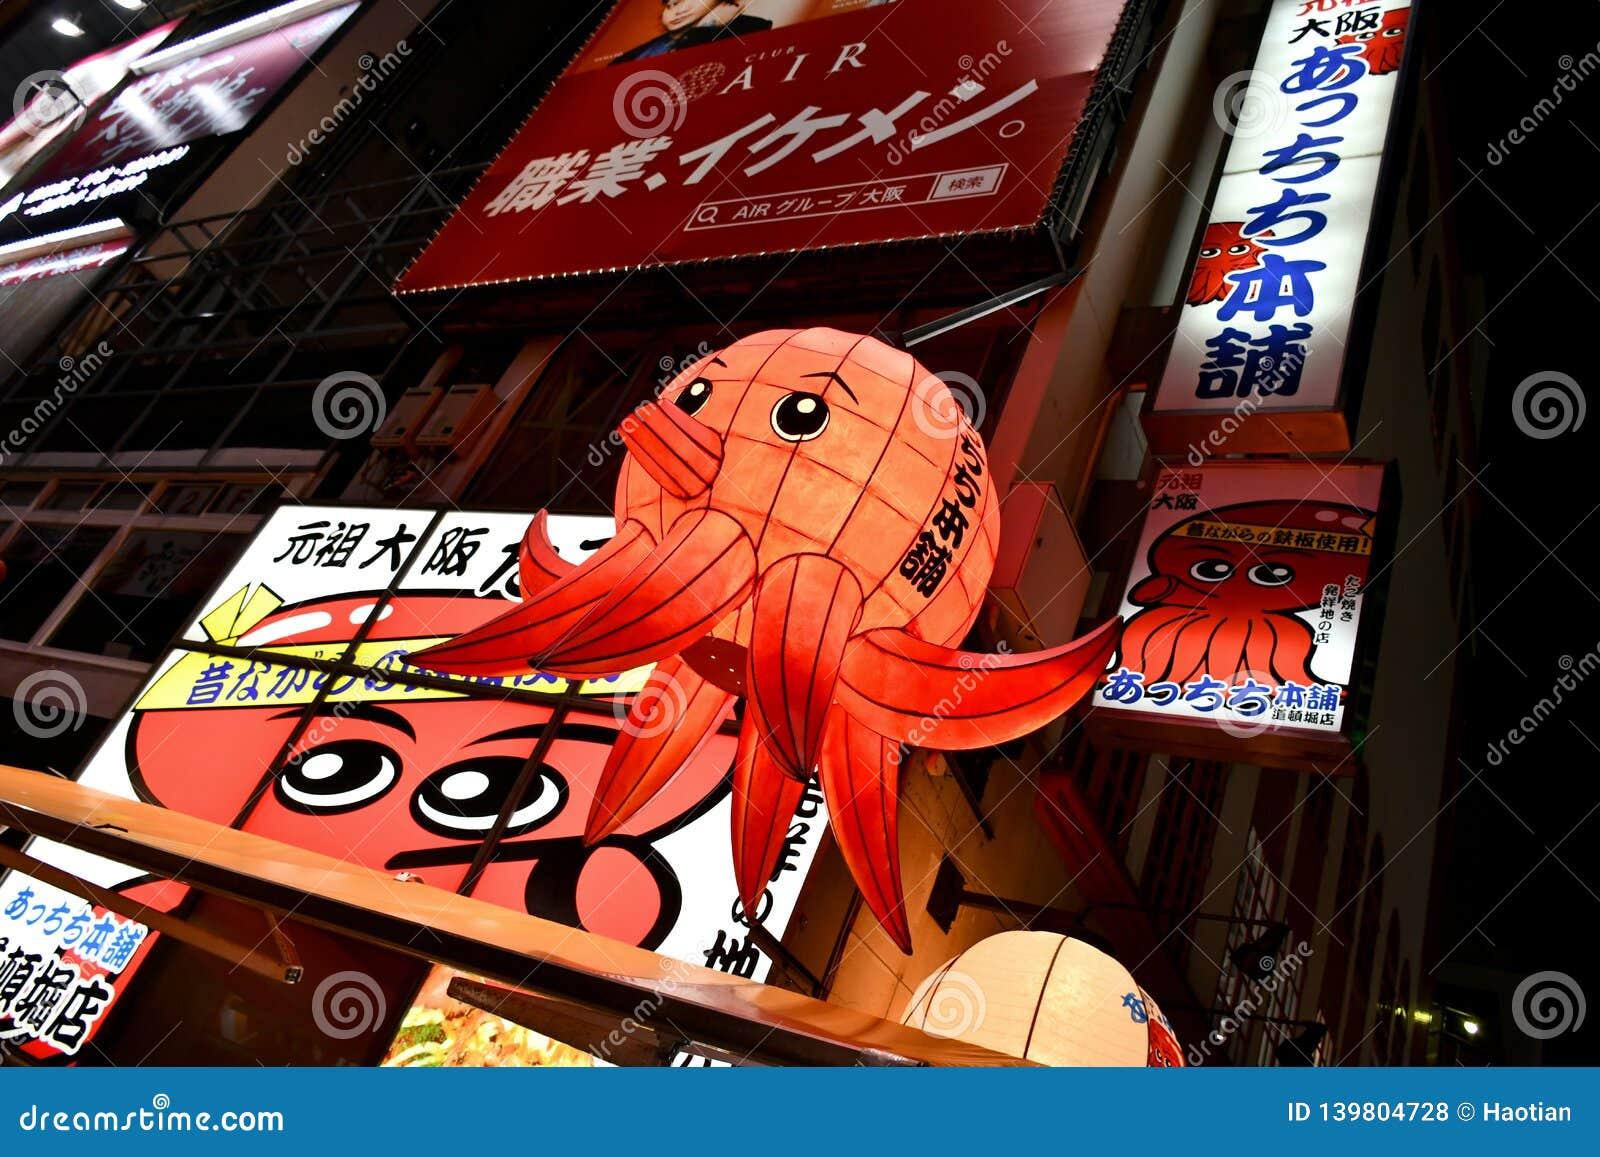 Dotonbori Shopping And Dining District, Osaka Editorial